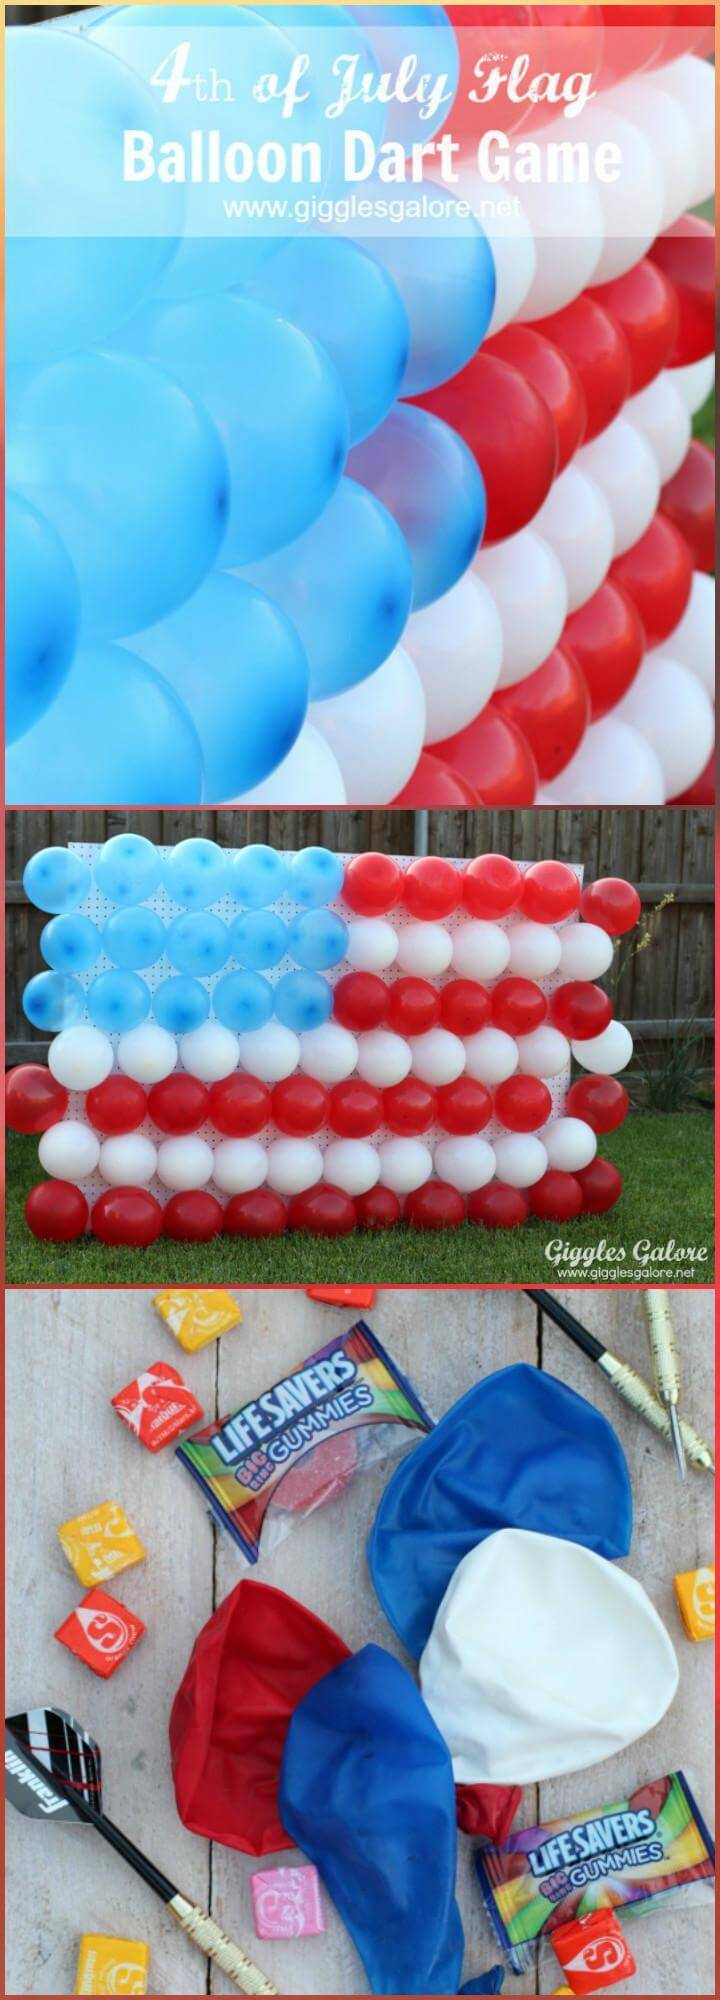 30 Diy 4th Of July Decorations Patriotic Diy Fourth Of July Decor